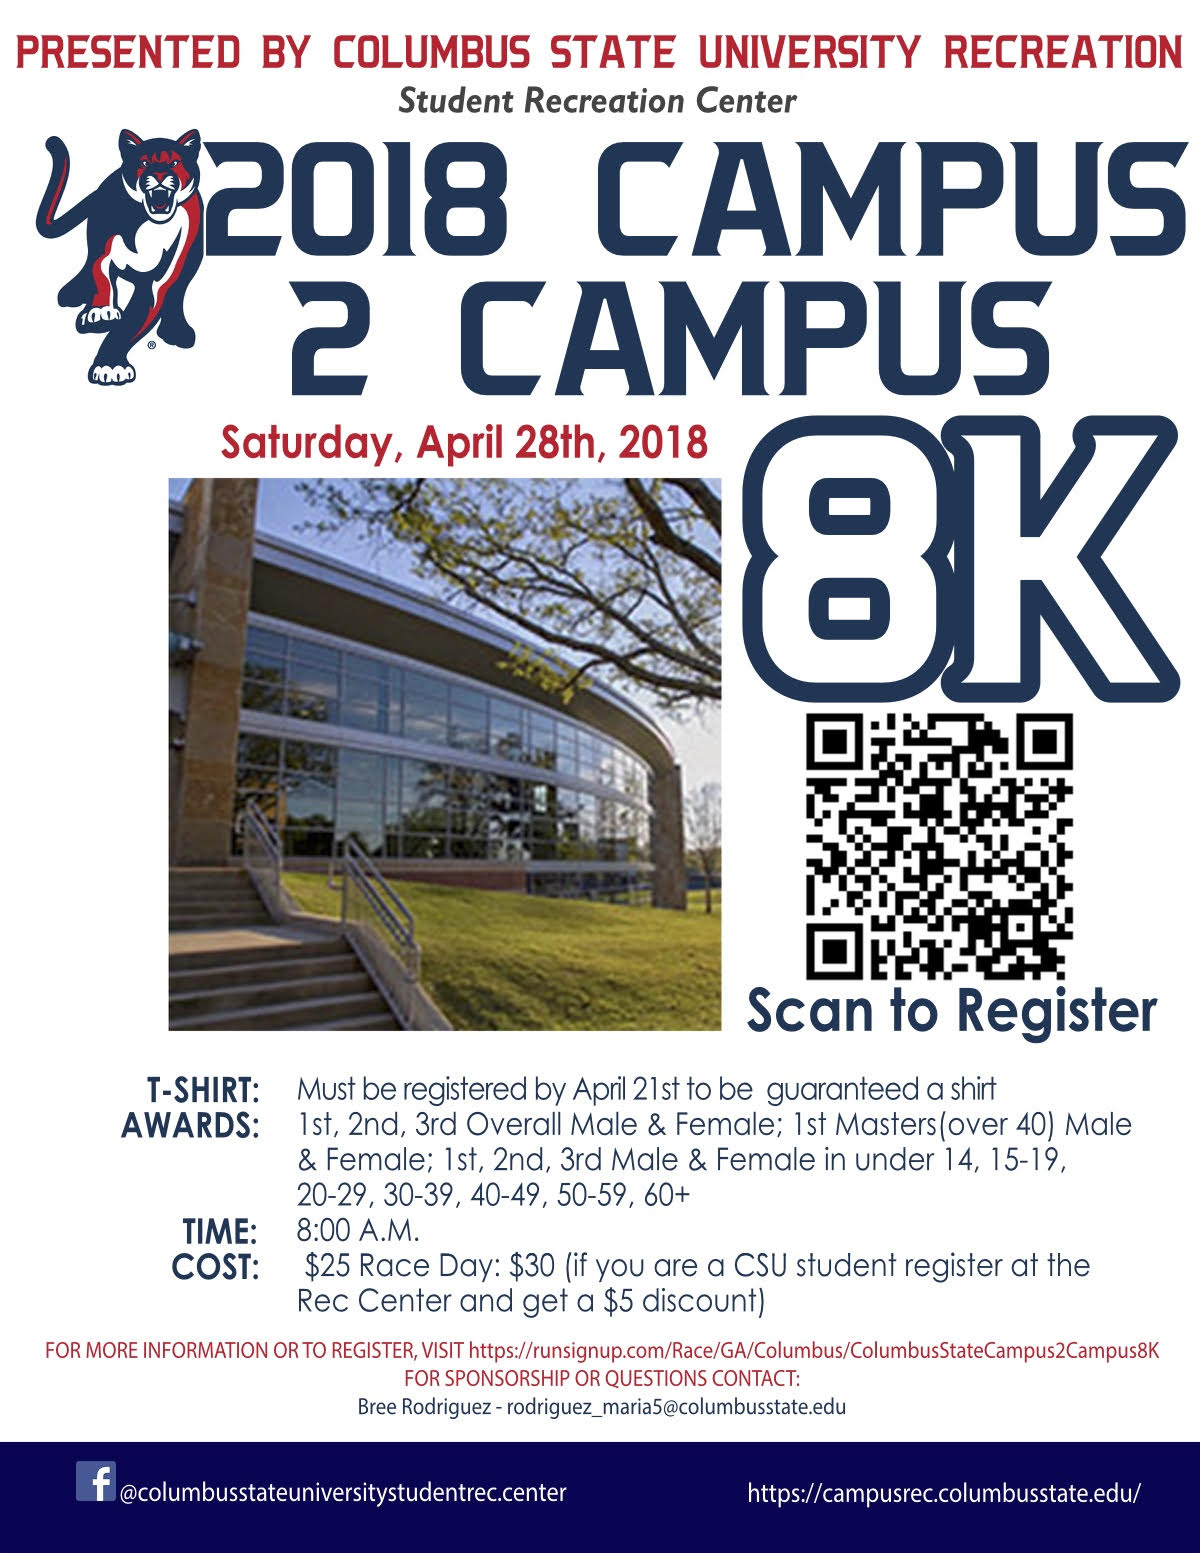 Campus 2 Campus 8K Race